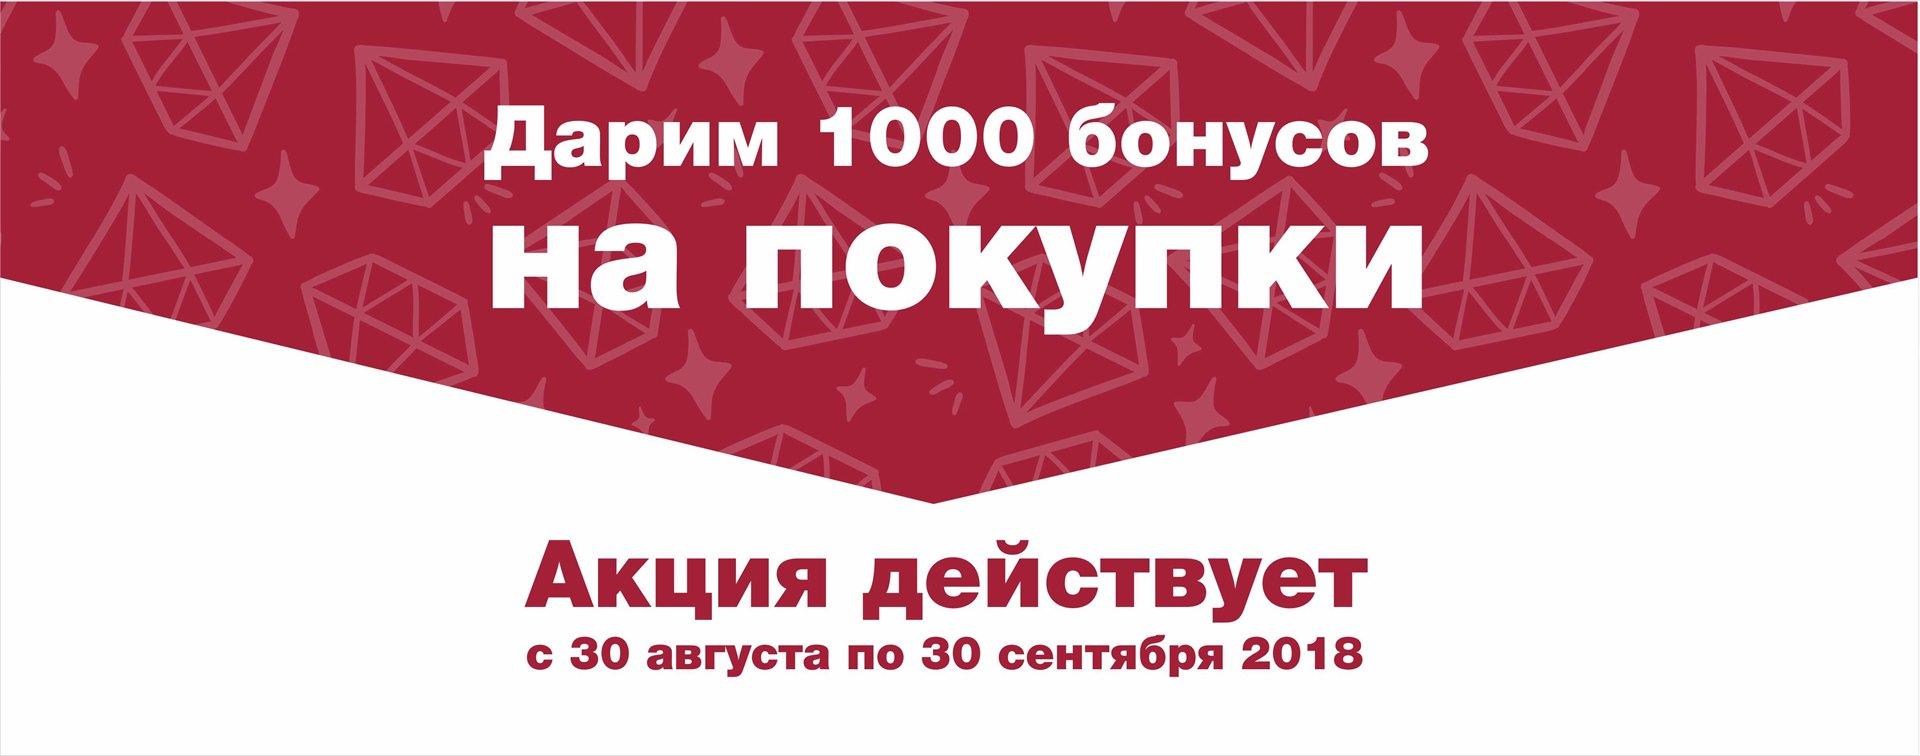 https://www.almazcom.ru/pub/img/Info/24/1000_bonusov_sajt_banner.jpg